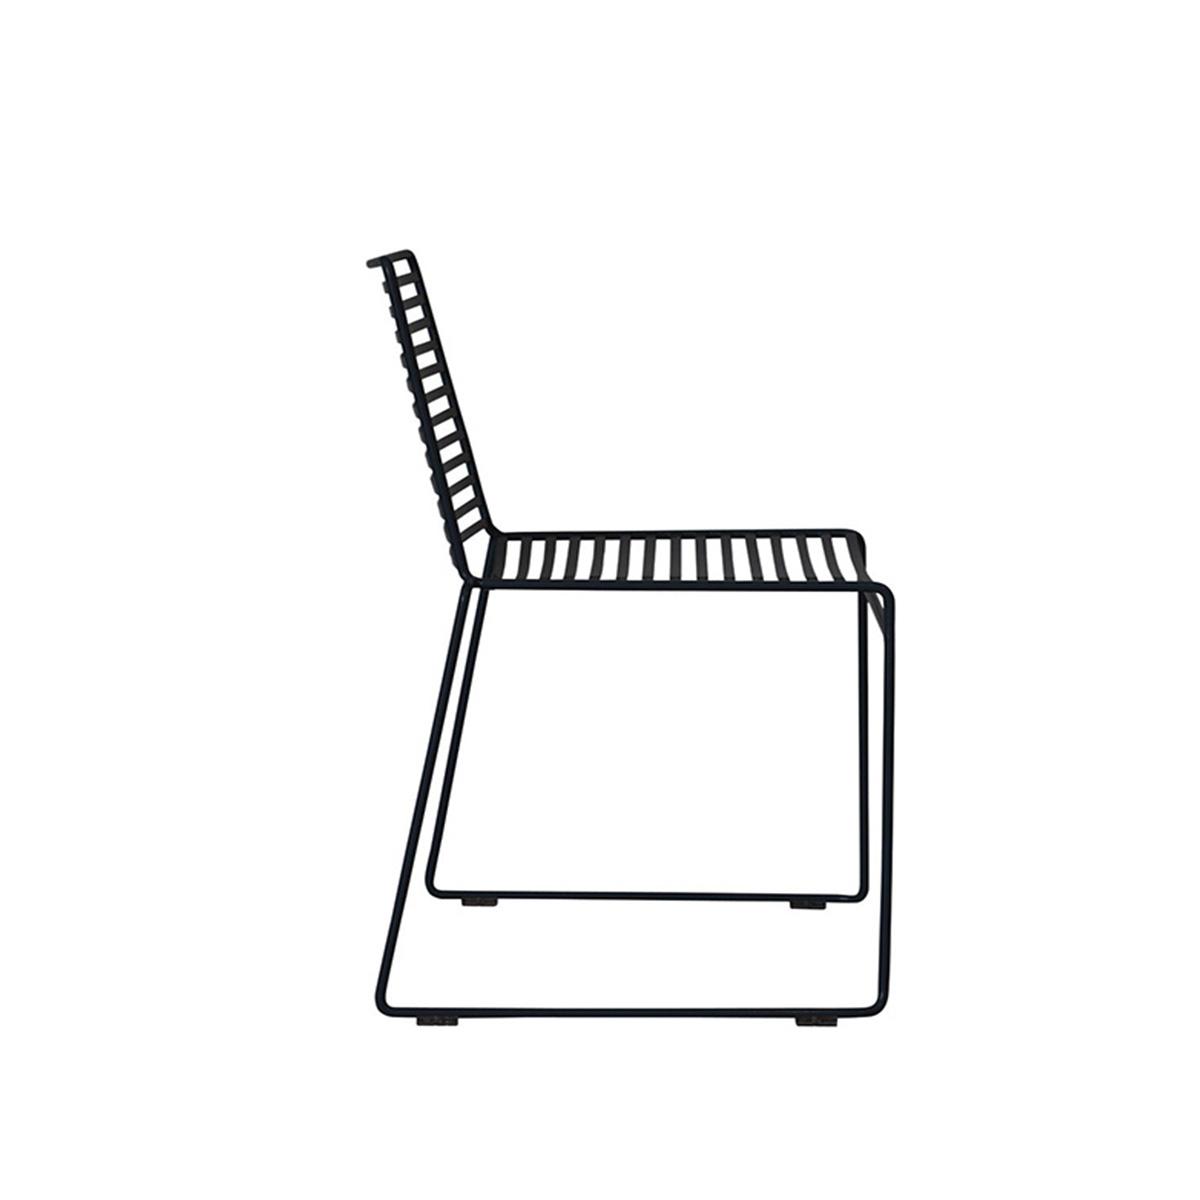 Crna metalna stolica MH-5007A